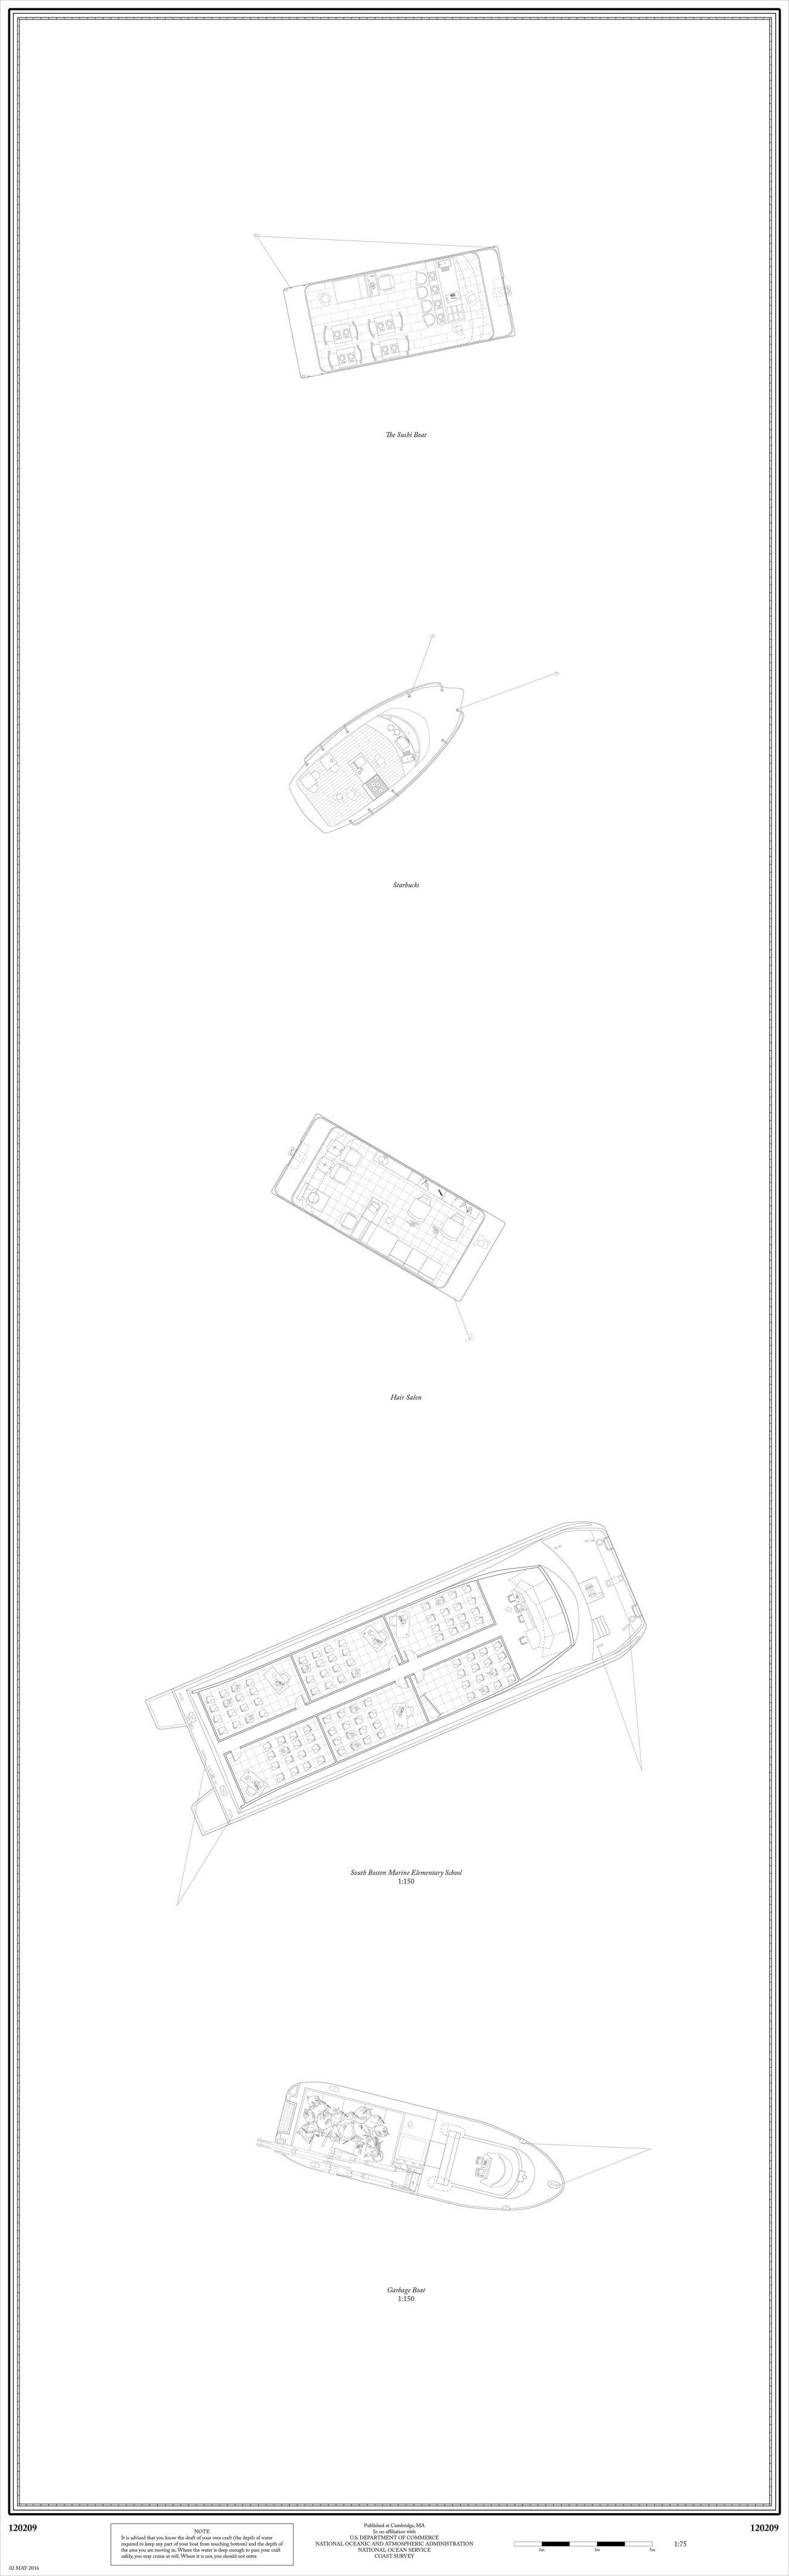 05012016 Boat Plans